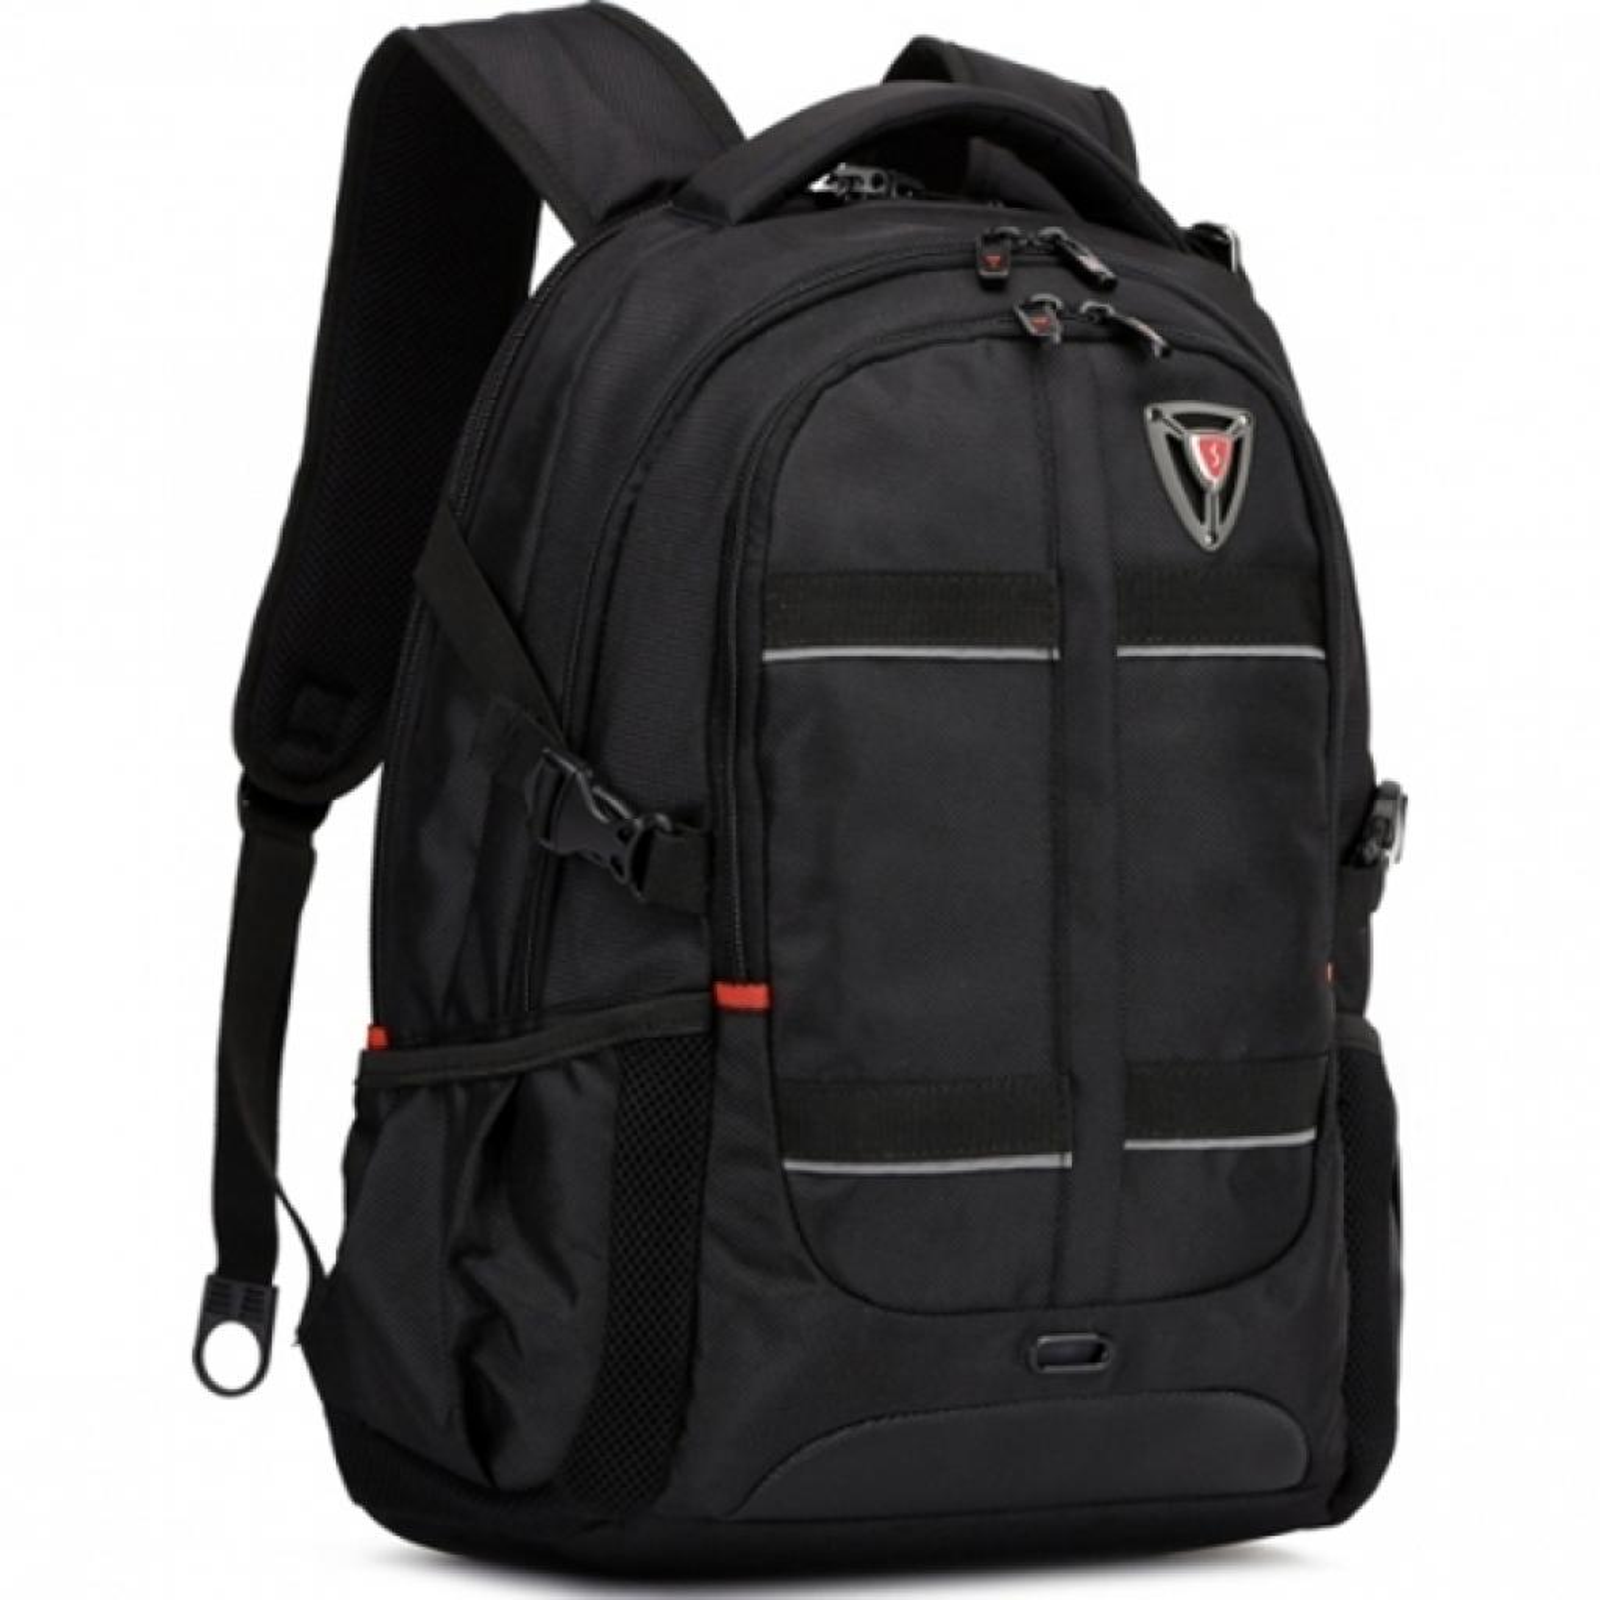 Рюкзак для ноутбука Continent 16'' BP-302 BK (BP-302BK) изображение 4